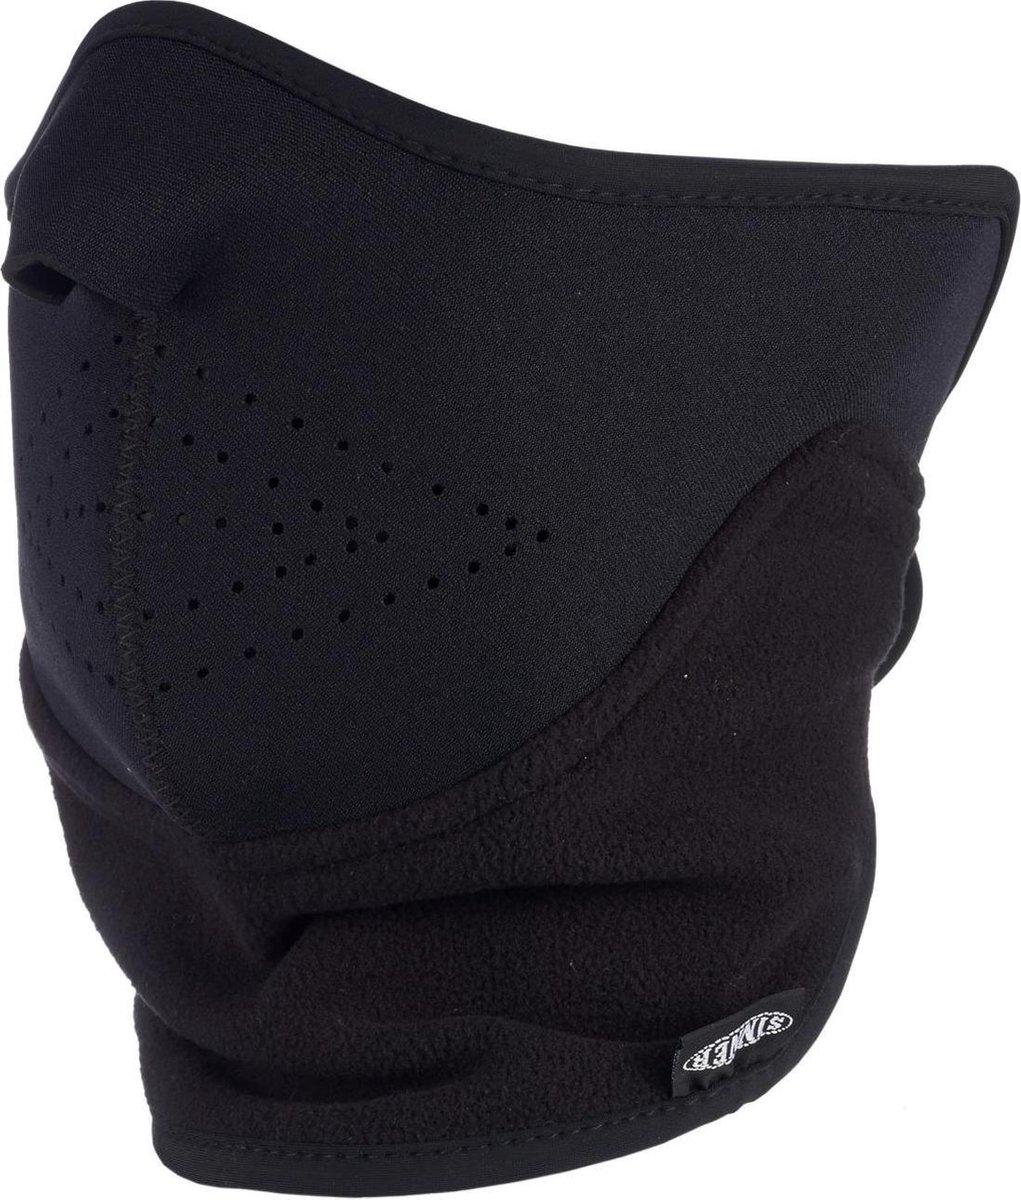 Sinner Unisex Facemask - Zwart - One Size